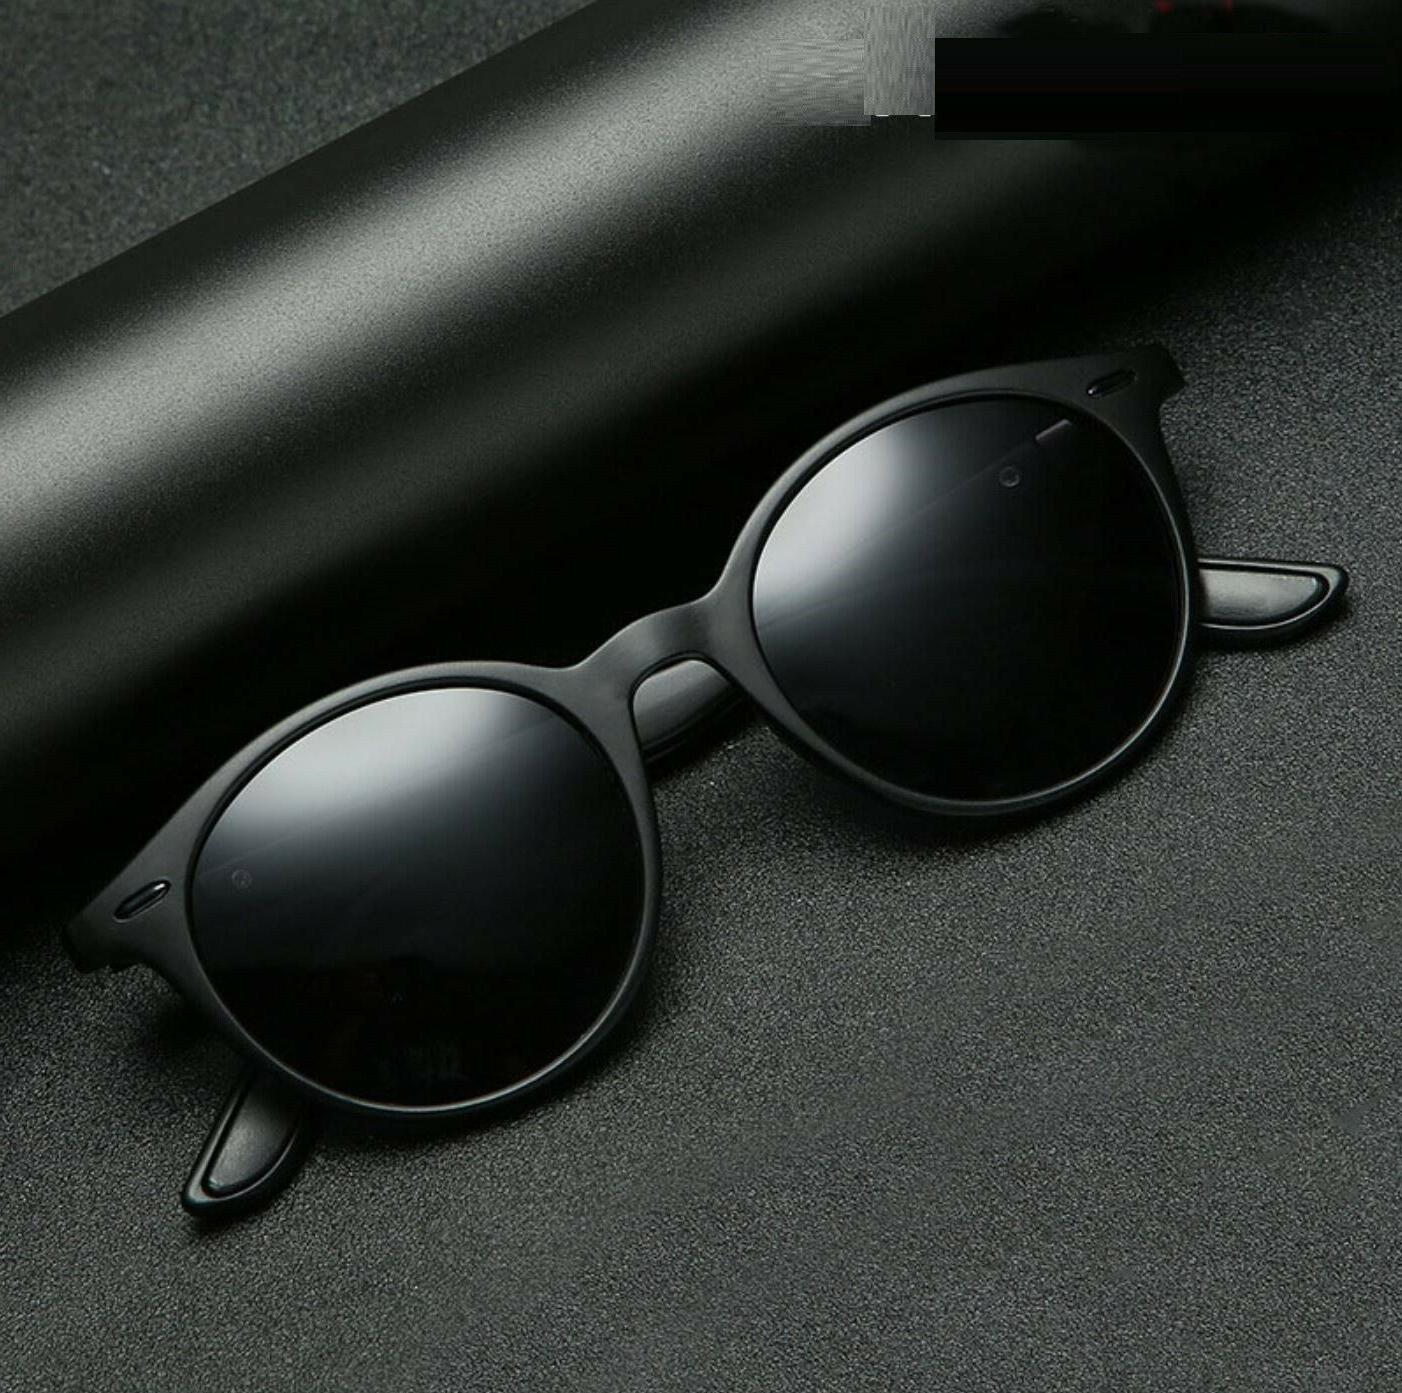 Men's Women's Sunglasses Light Round Classic Fashion Shades